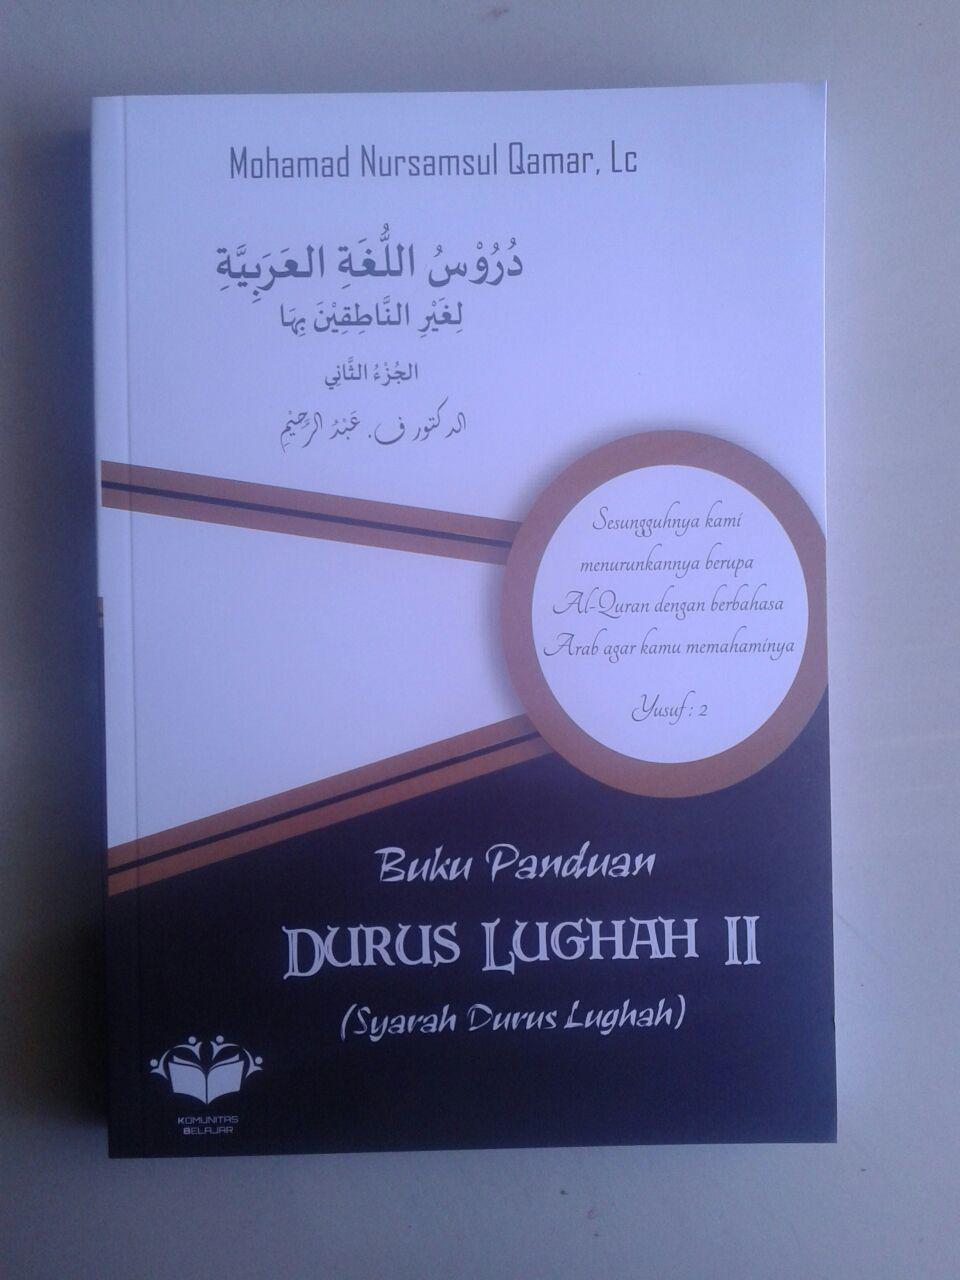 Buku Panduan Durus Lughah 2 Syarah Durusul Lughah cover 2